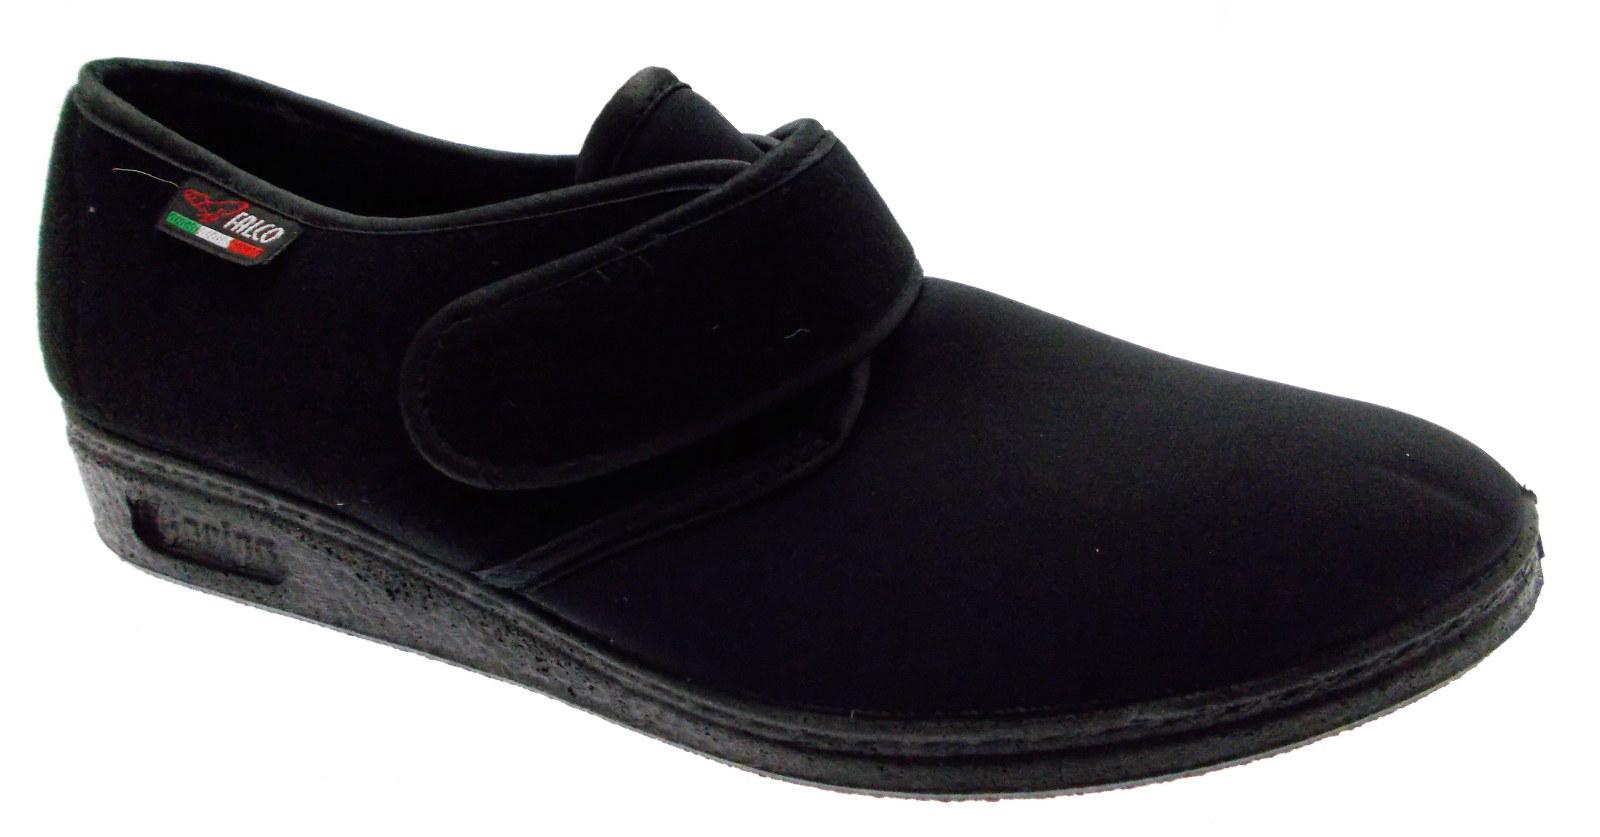 Slipper Velcro cloth noir stretch physiotherapy extra large ART 902 Gaviga